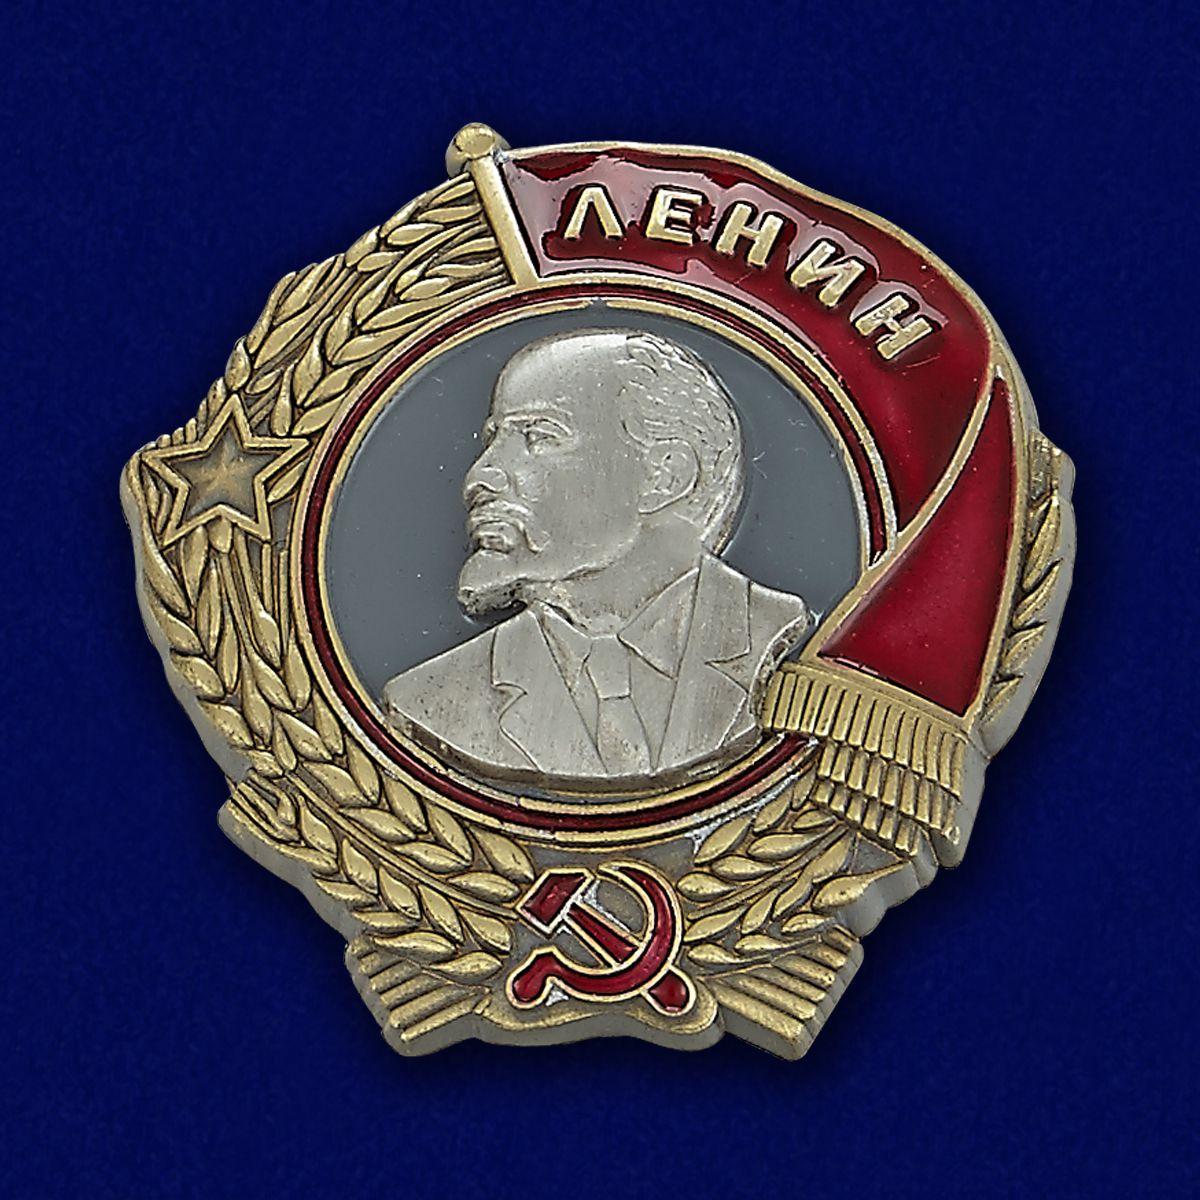 Орден Ленина (20 декабря 1939 г.)